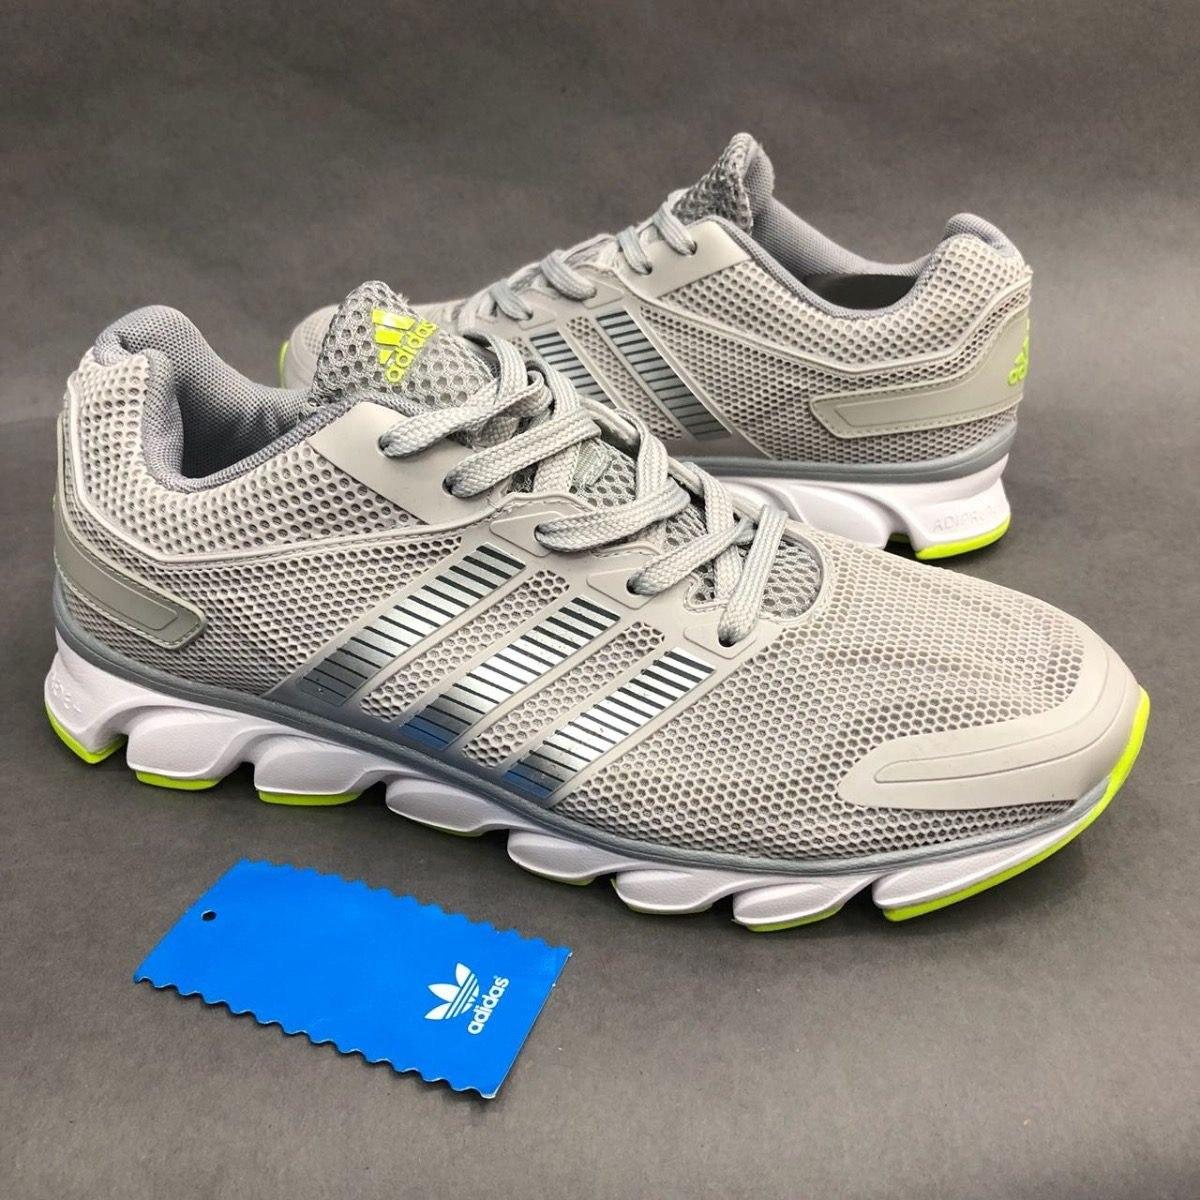 uk availability fb8eb 21912 ... new arrivals tenis zapatillas adidas climacool ride gris verde hombre.  cargando zoom. 085ba 82037